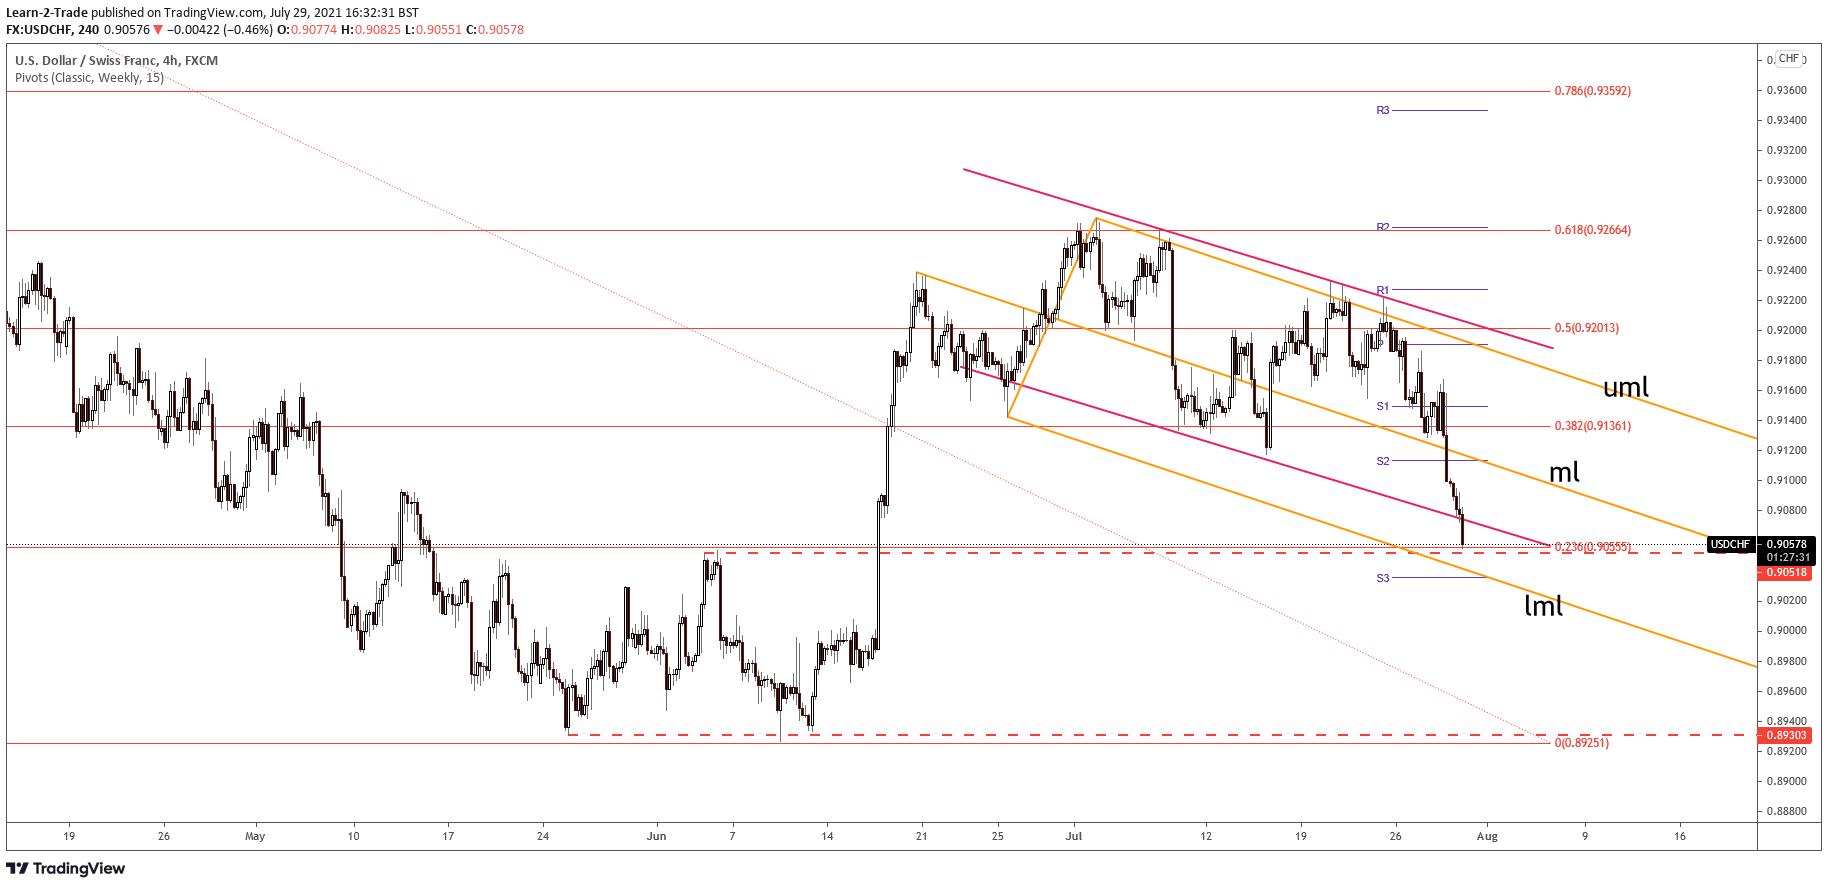 USD/CHF price n 4-hour chart